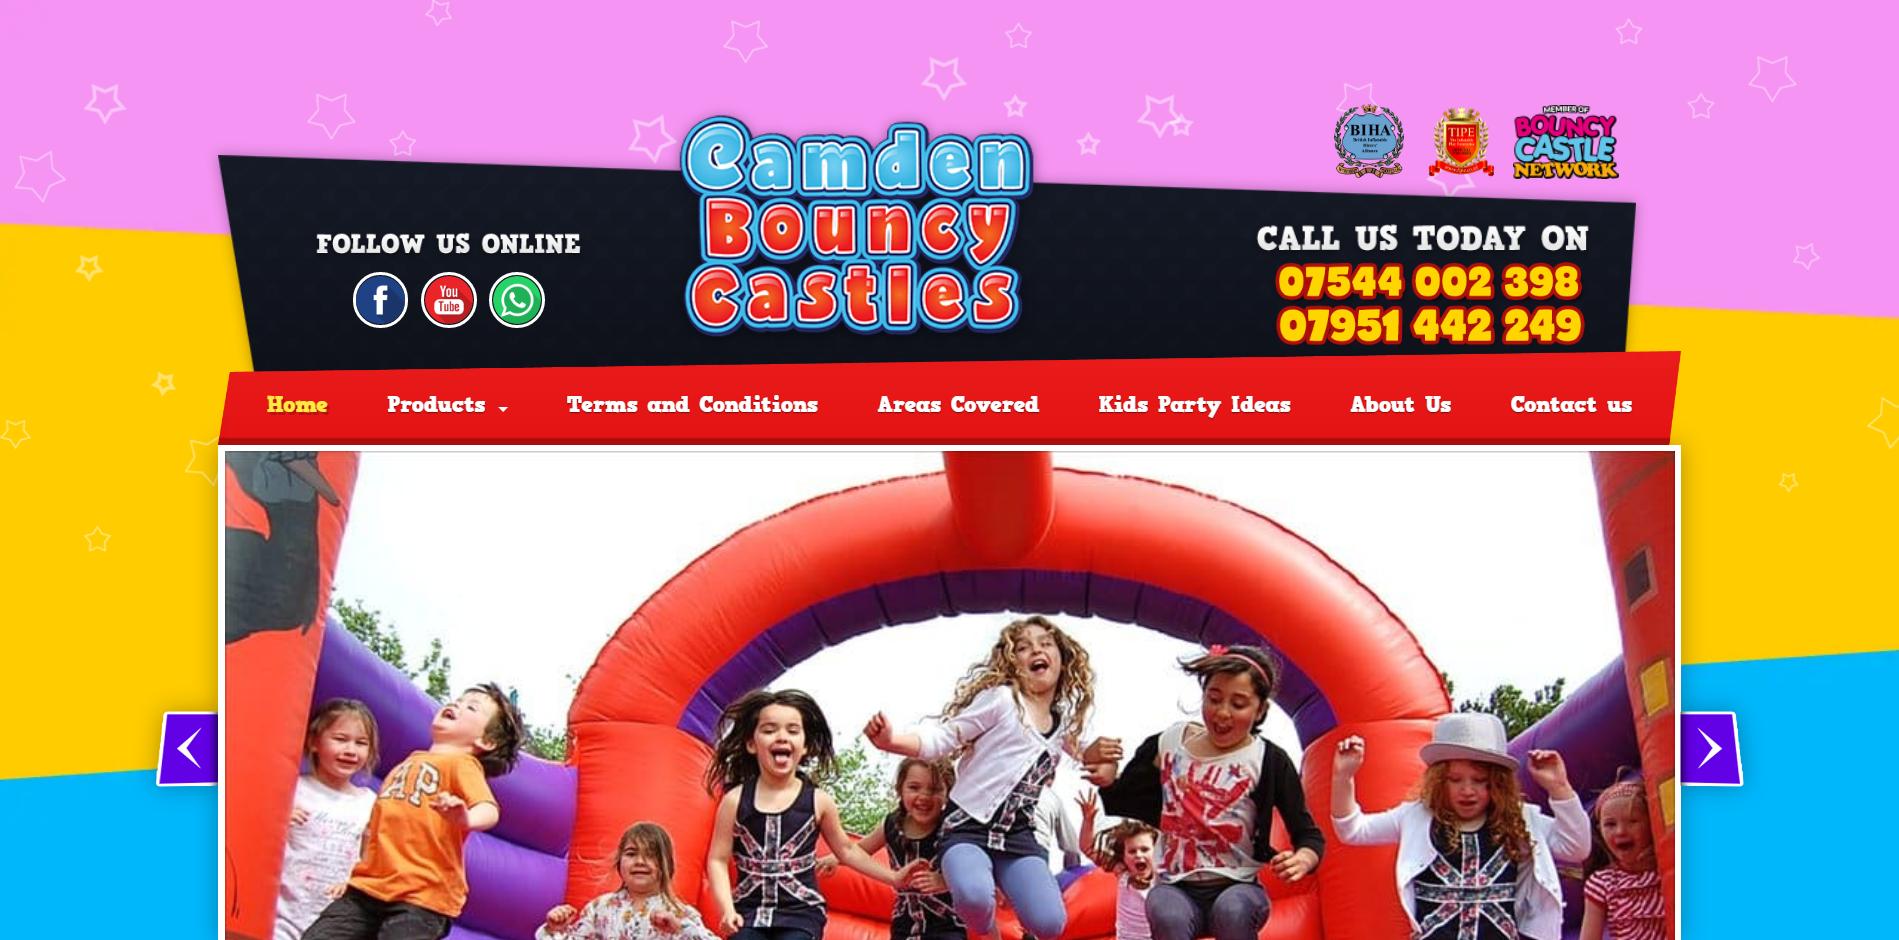 Camden Bouncy Castle